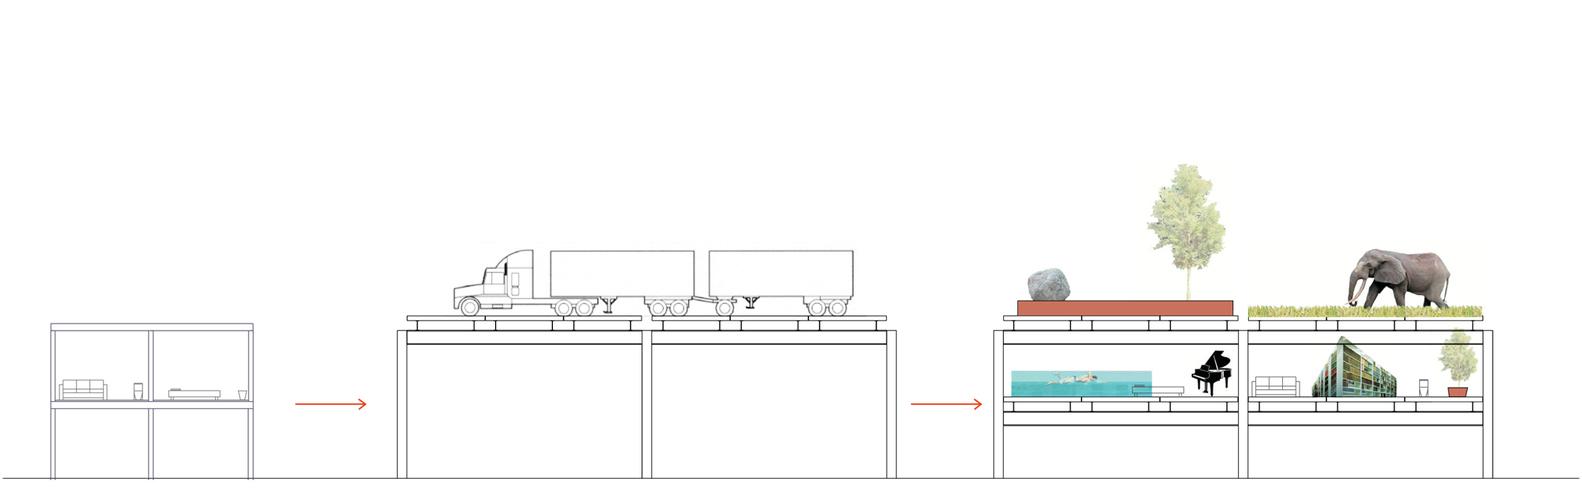 Gallery Of Big Dig Building Single Speed Design 41